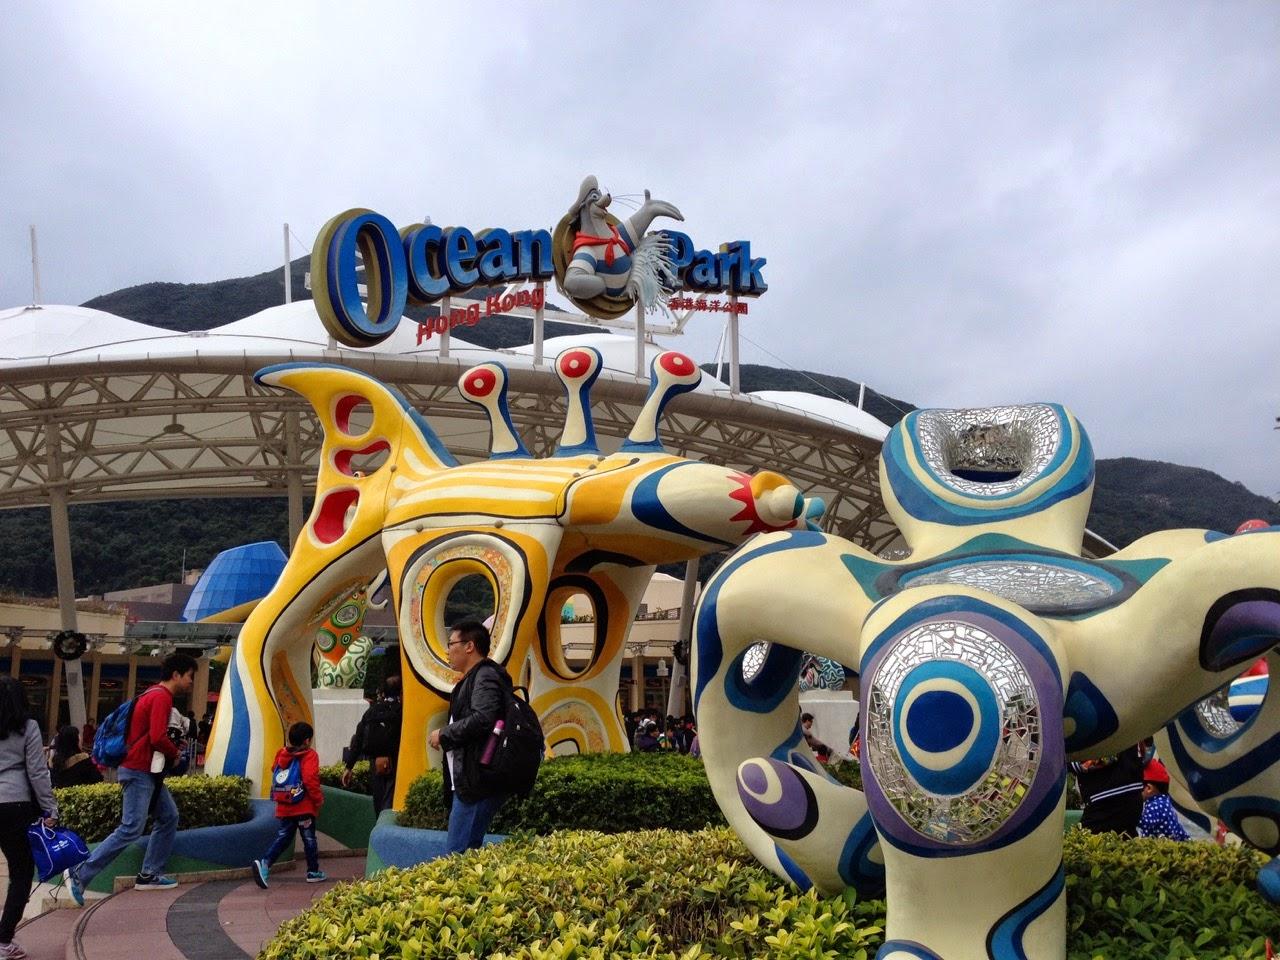 hong kong ocean park hours